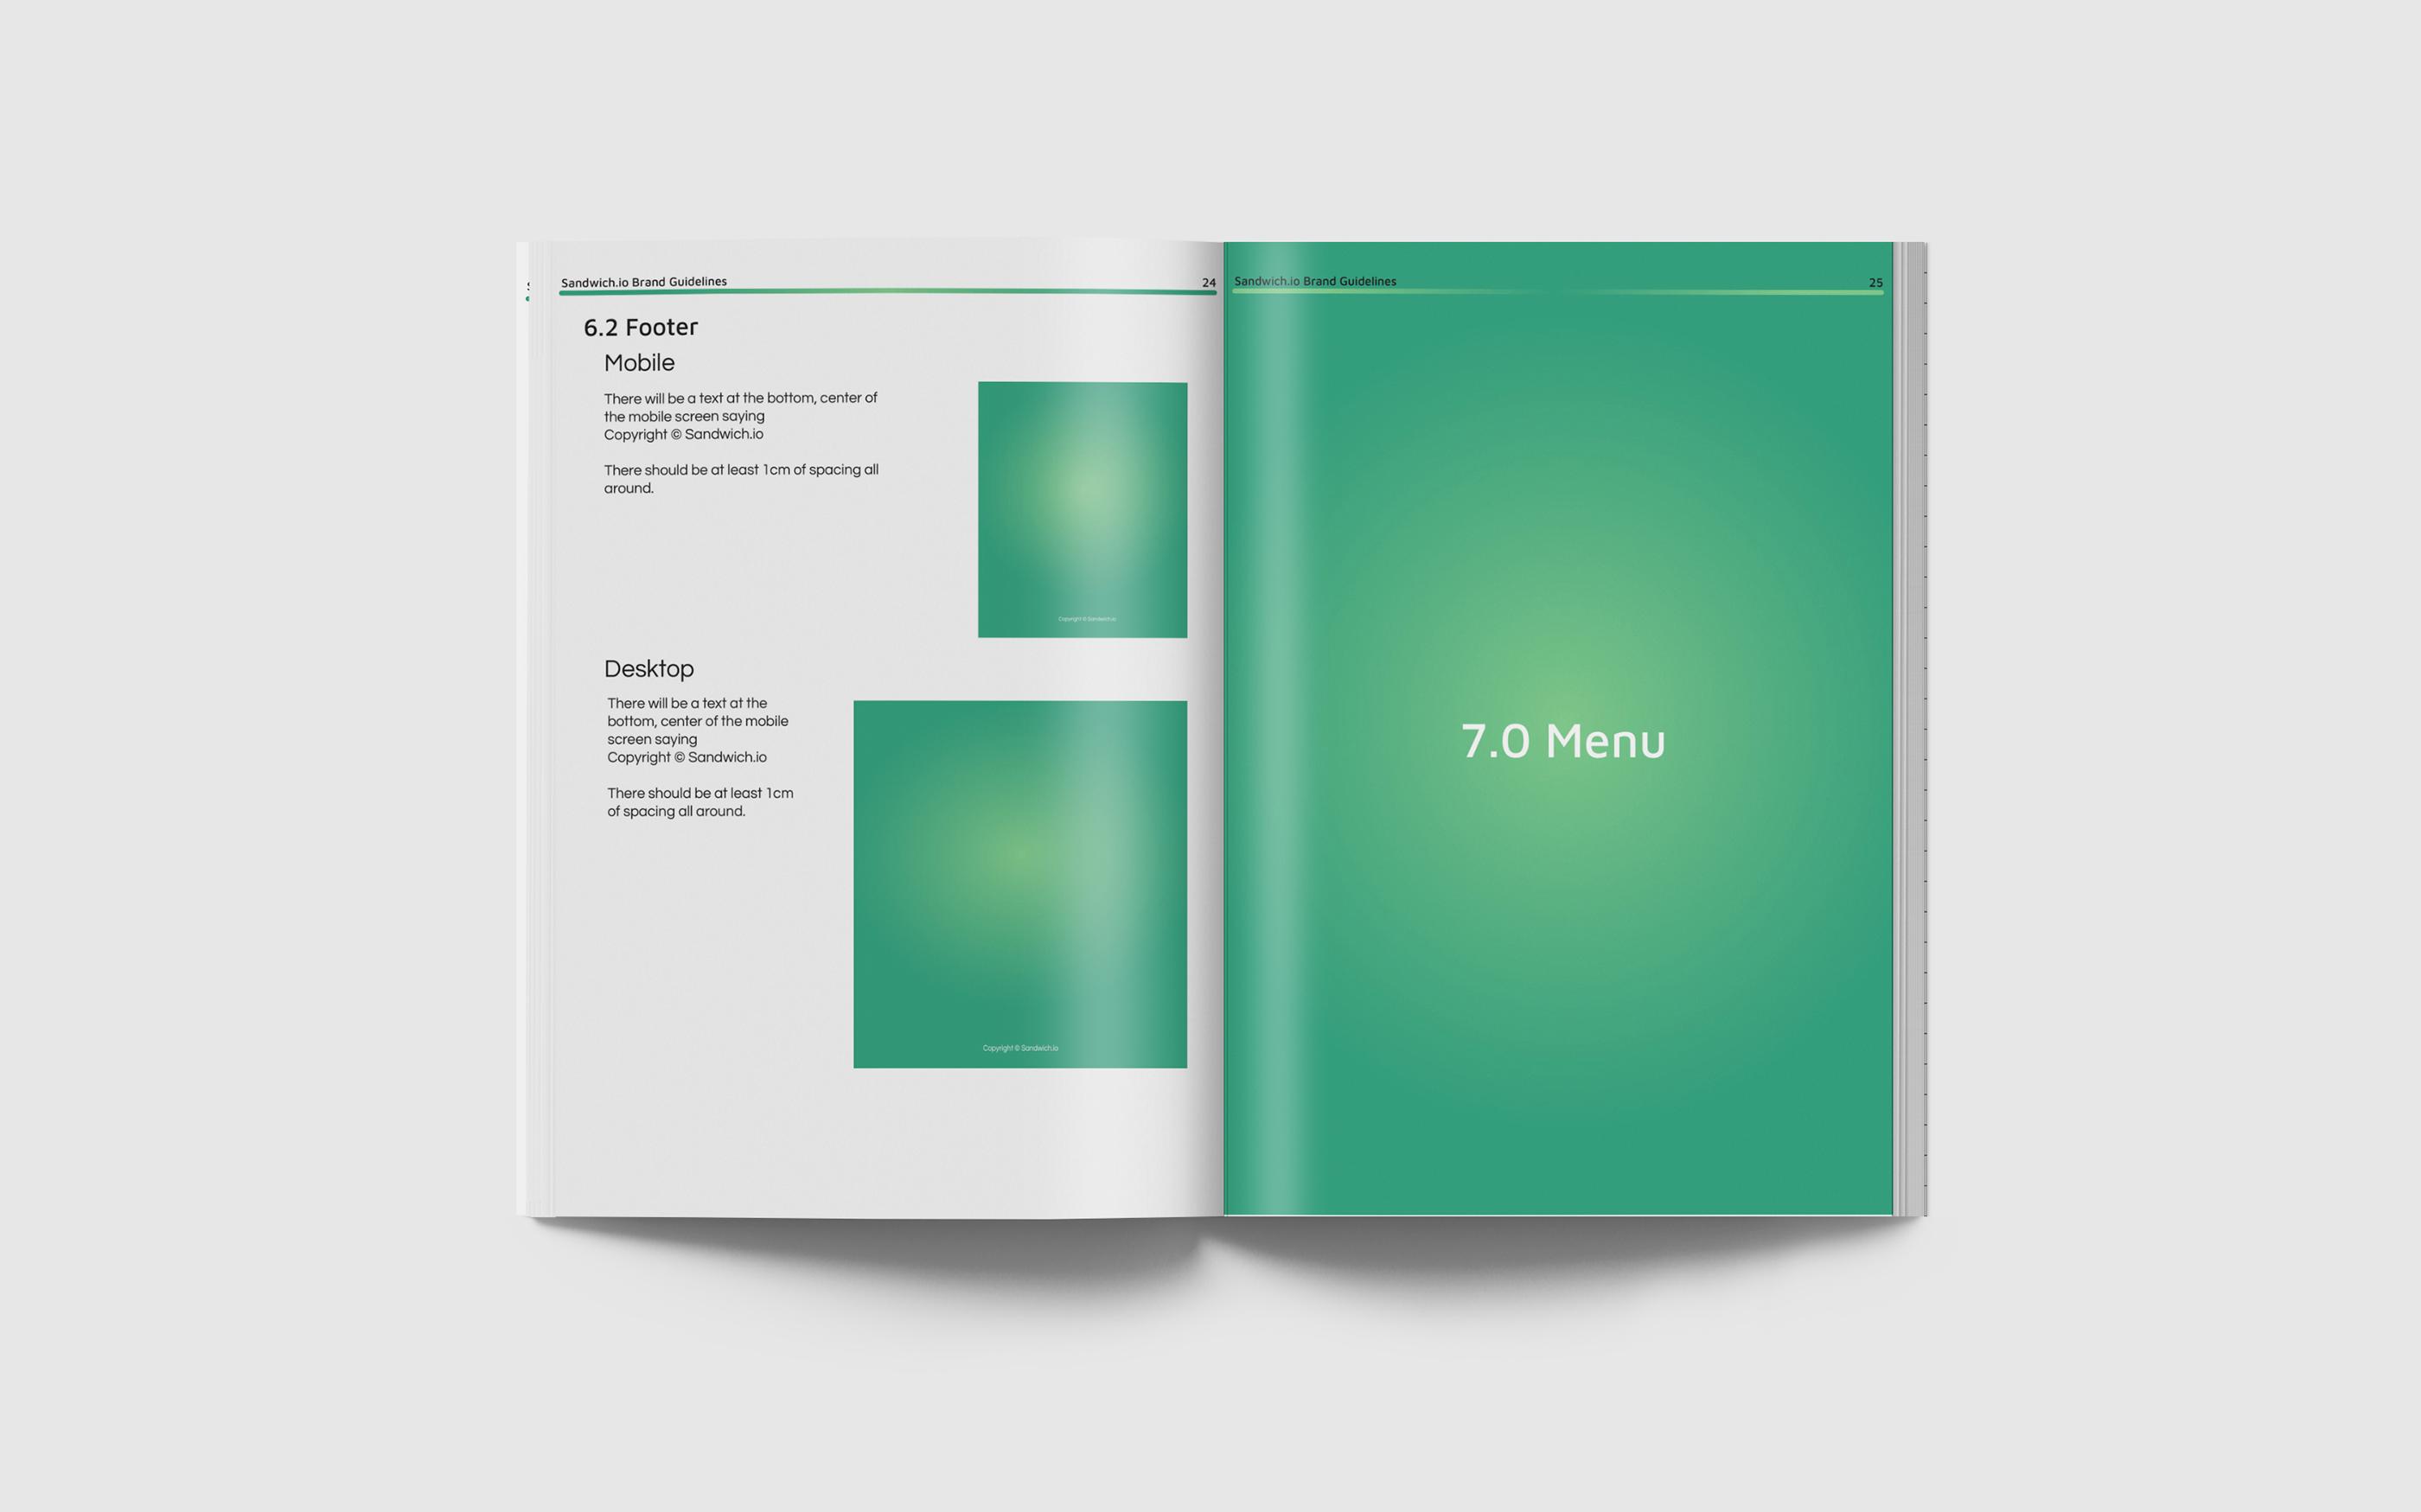 Sandwich.io Brand Guidelines | Monika Szucs | Digital Design and Development Diploma